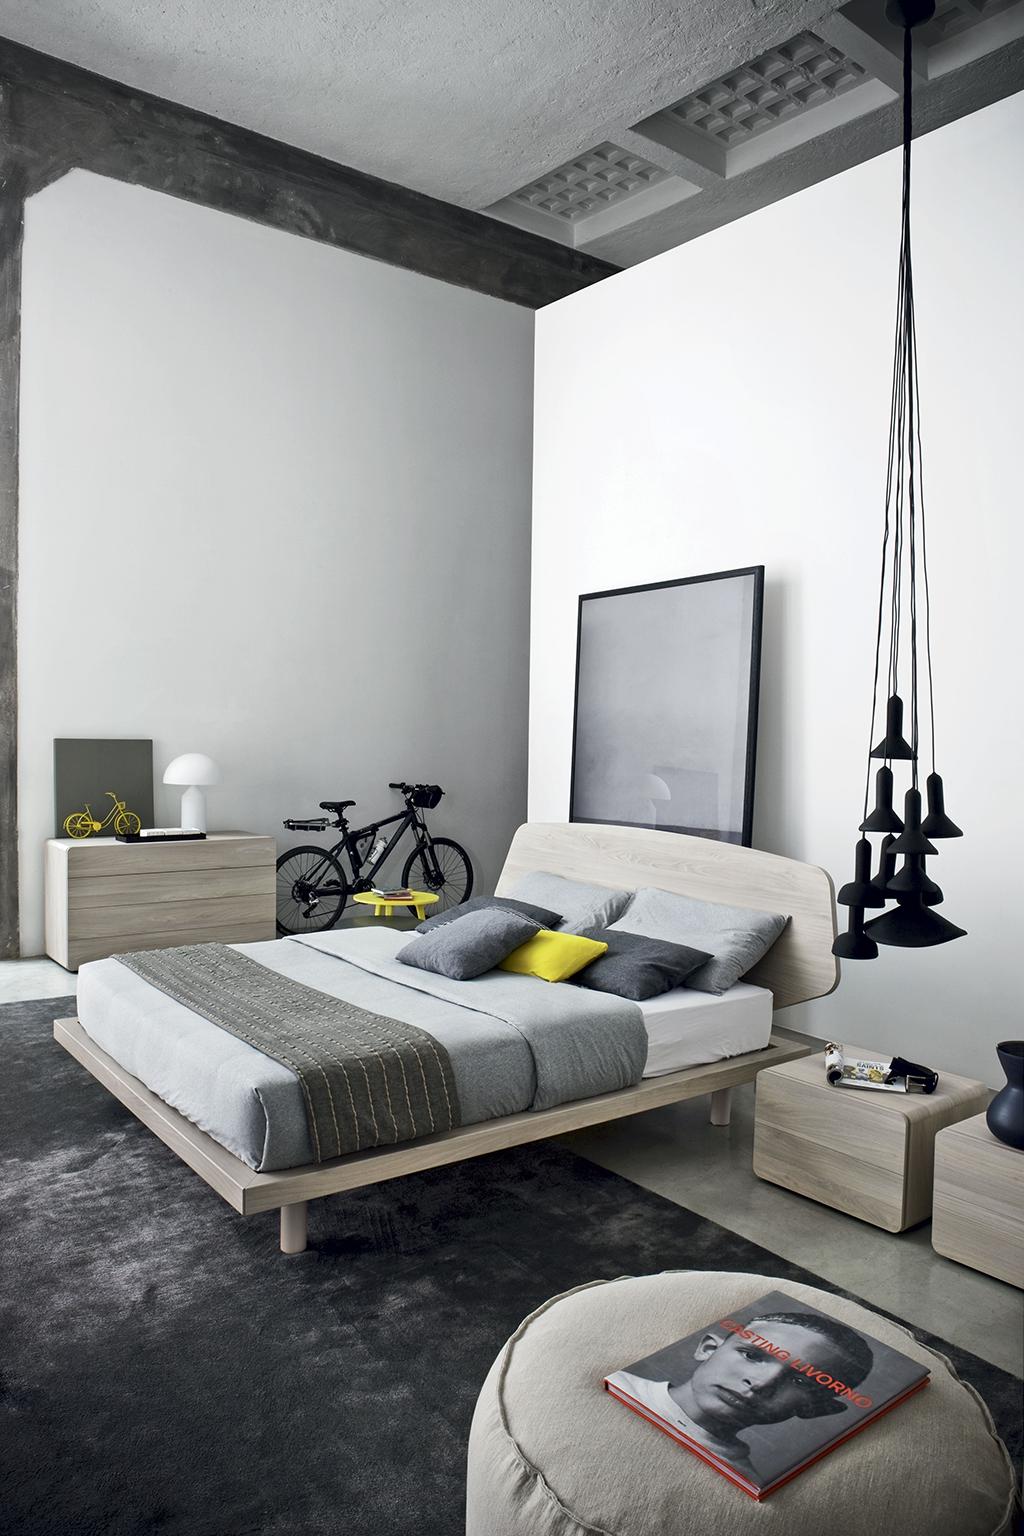 amore 076 fitted bedroom furniture wardrobes uk lawrence walsh furniture. Black Bedroom Furniture Sets. Home Design Ideas